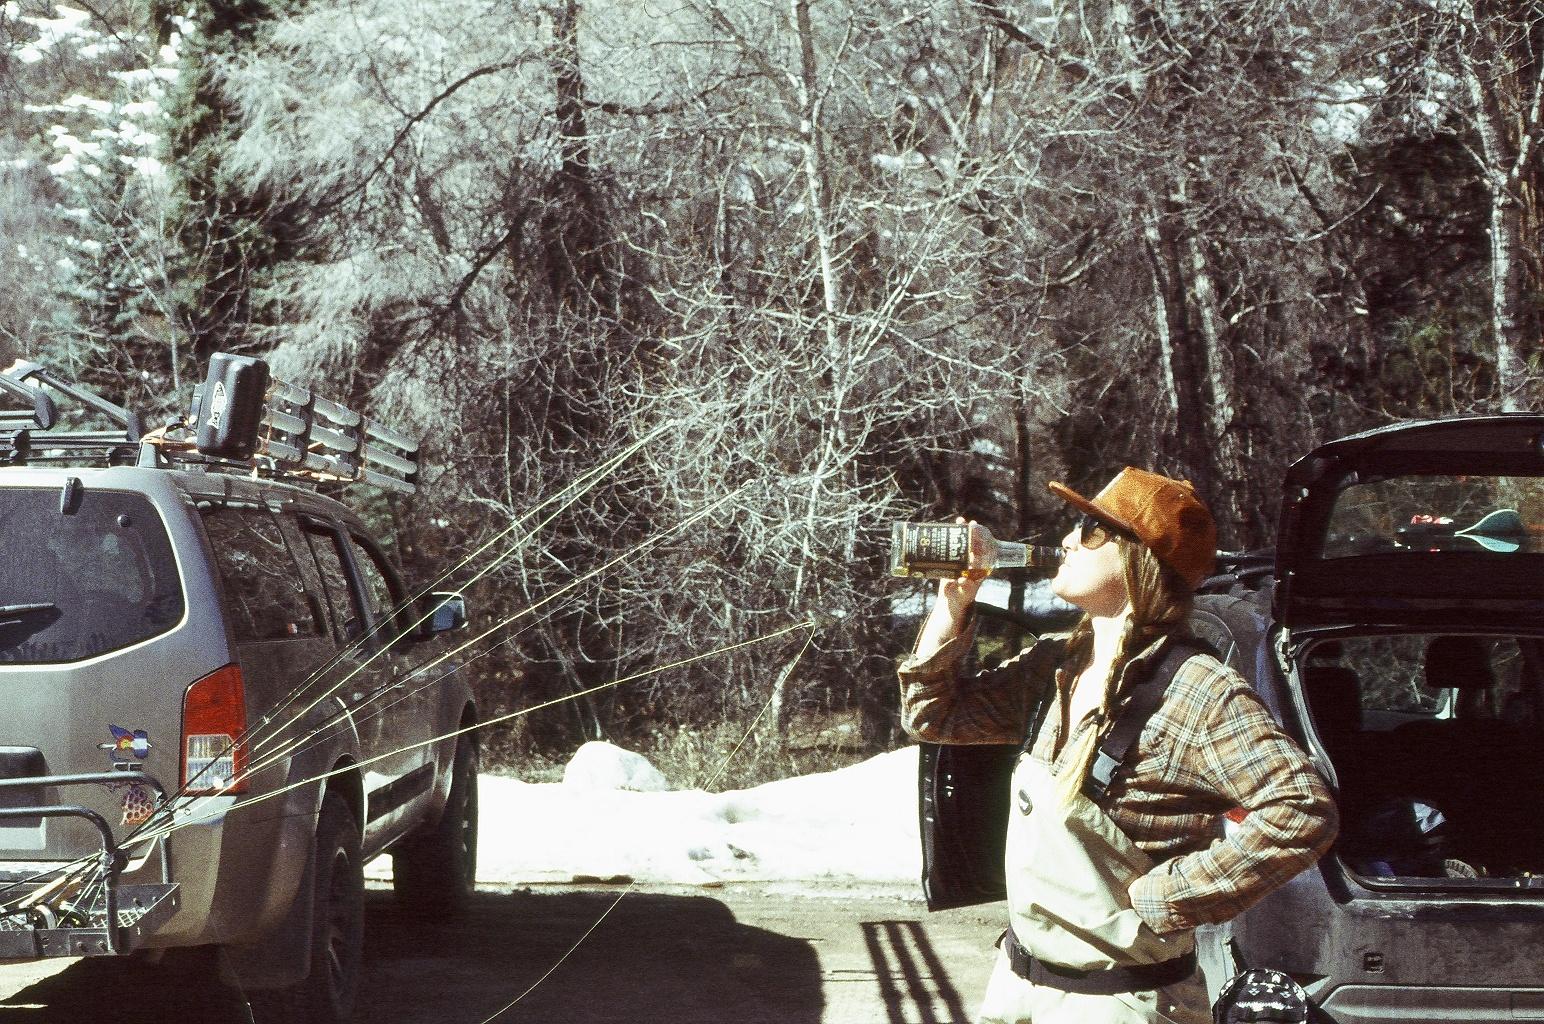 10 AM on the Roaring Fork, Aspen, Colorado